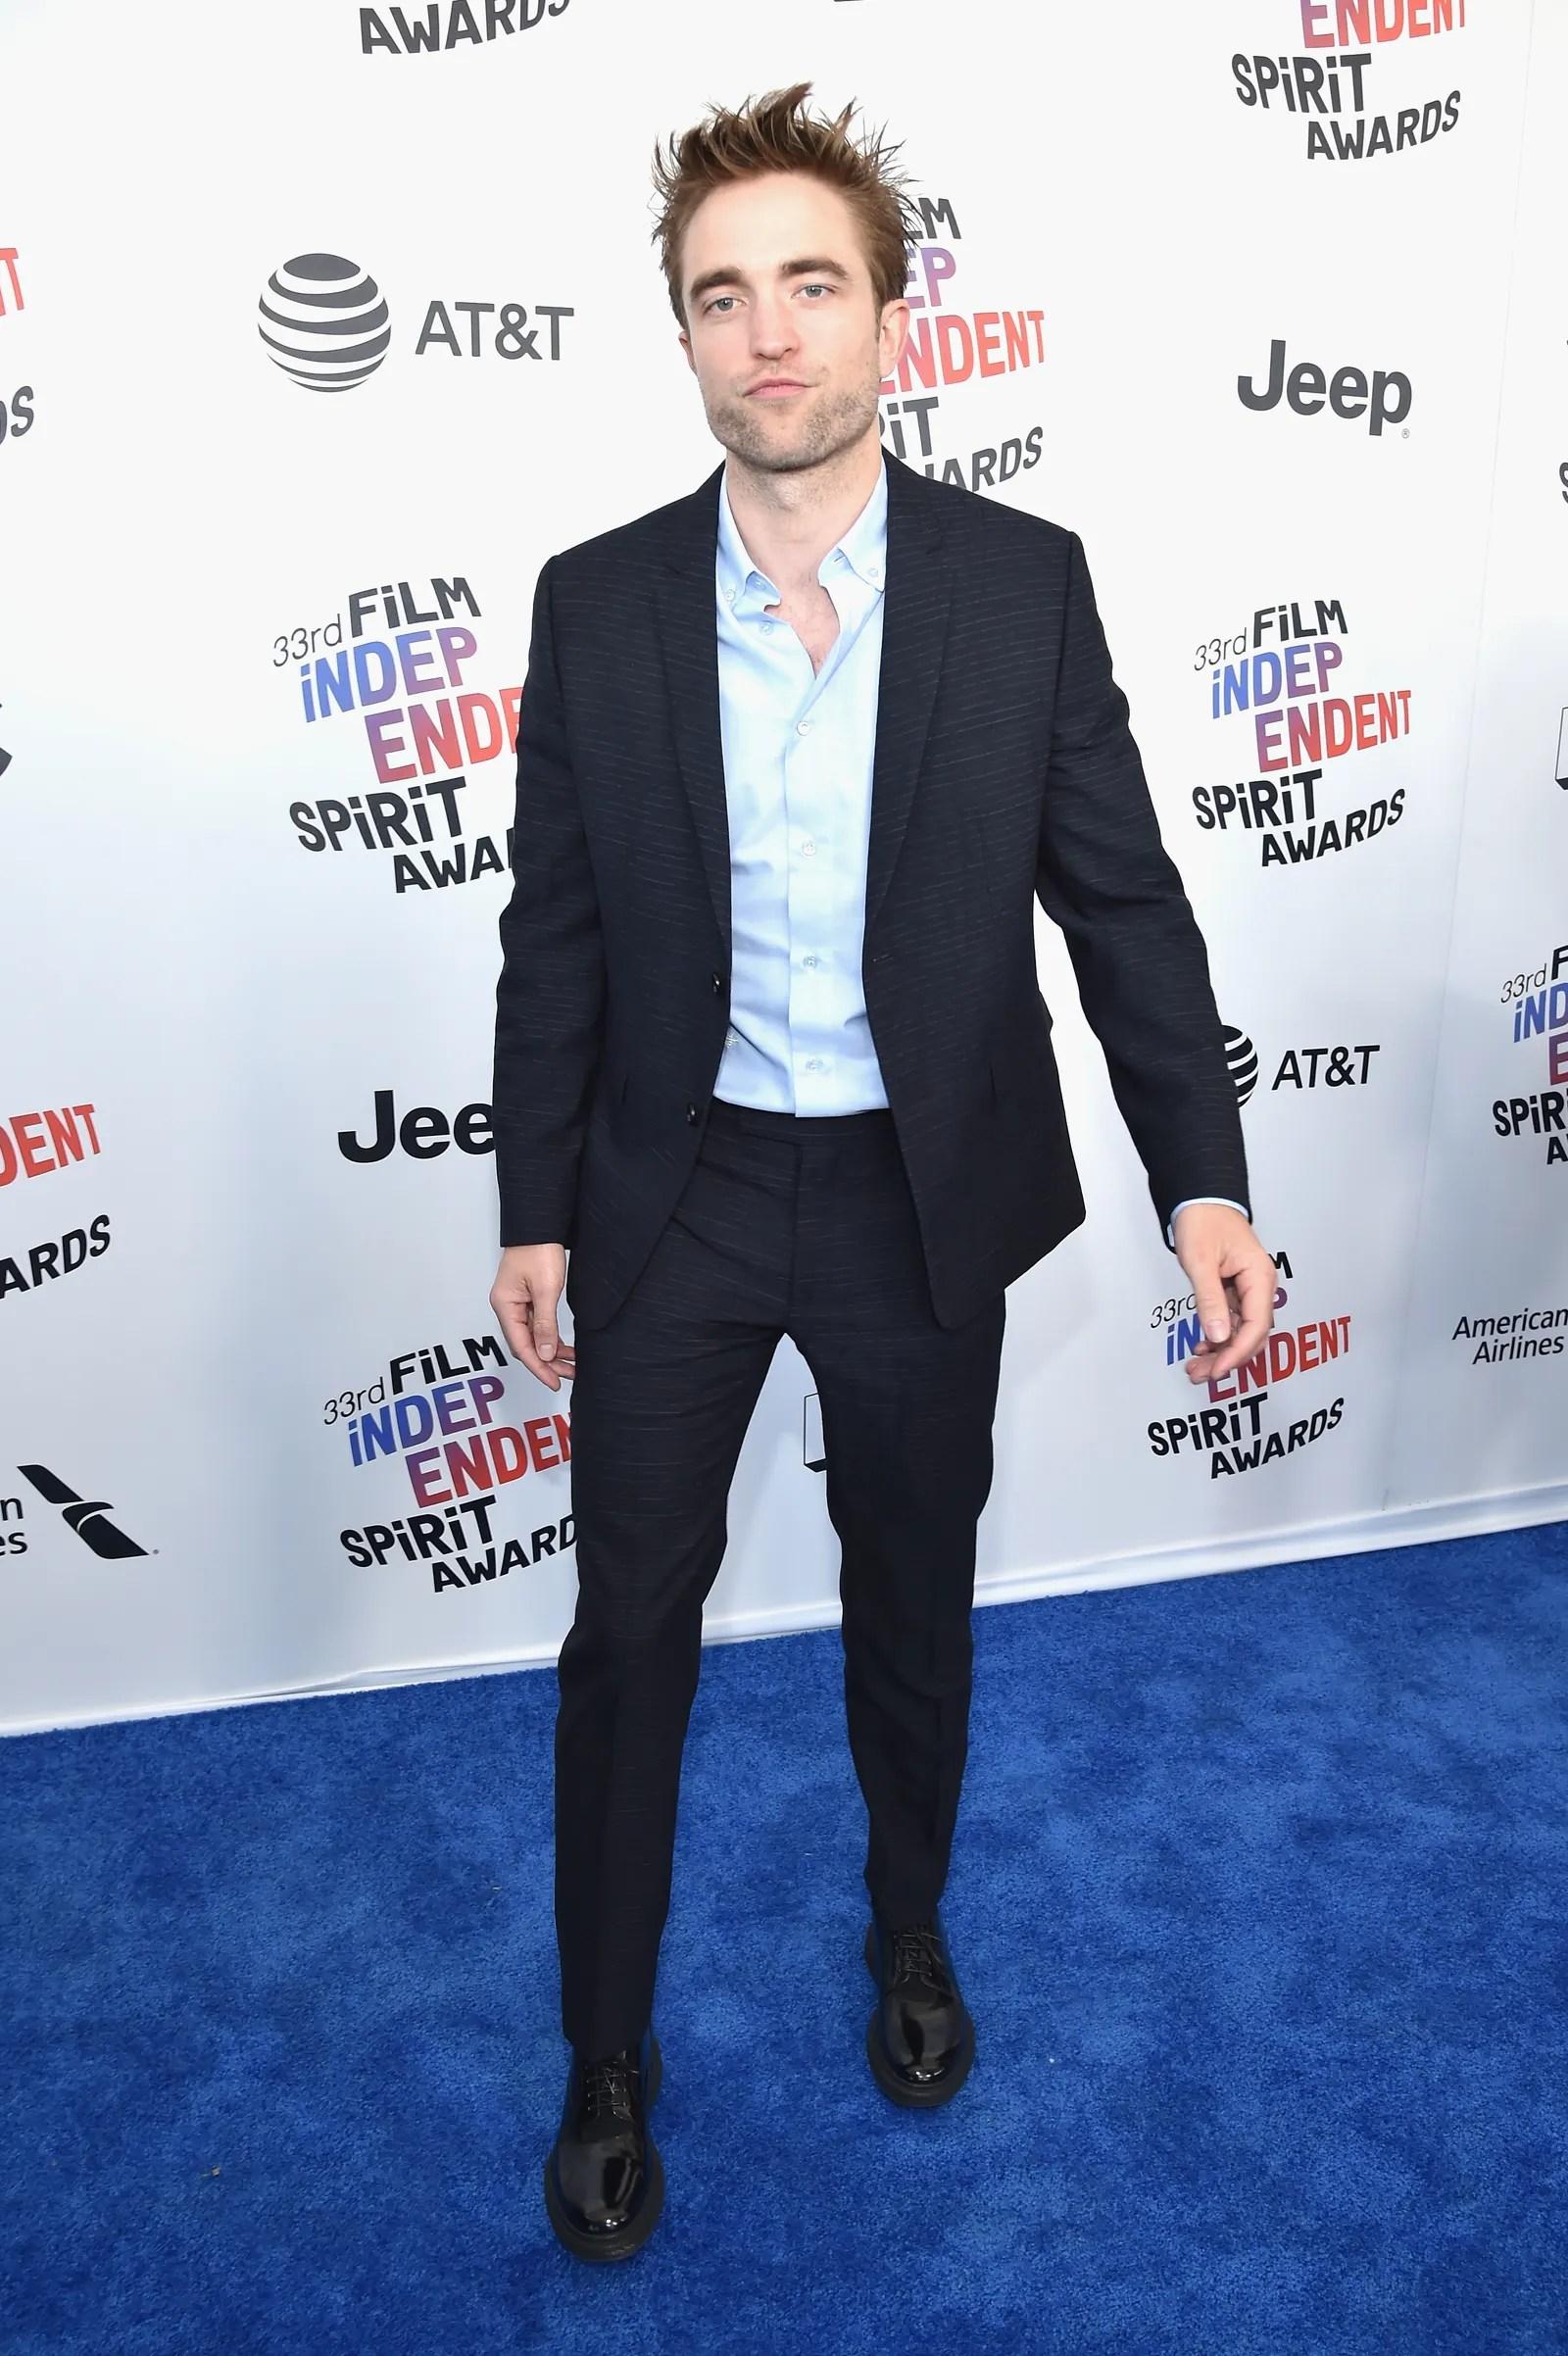 SANTA MONICA CA MARCH 03 Robert Pattinson attends the 2018 Film Independent Spirit Awards on March 3 2018 in Santa...